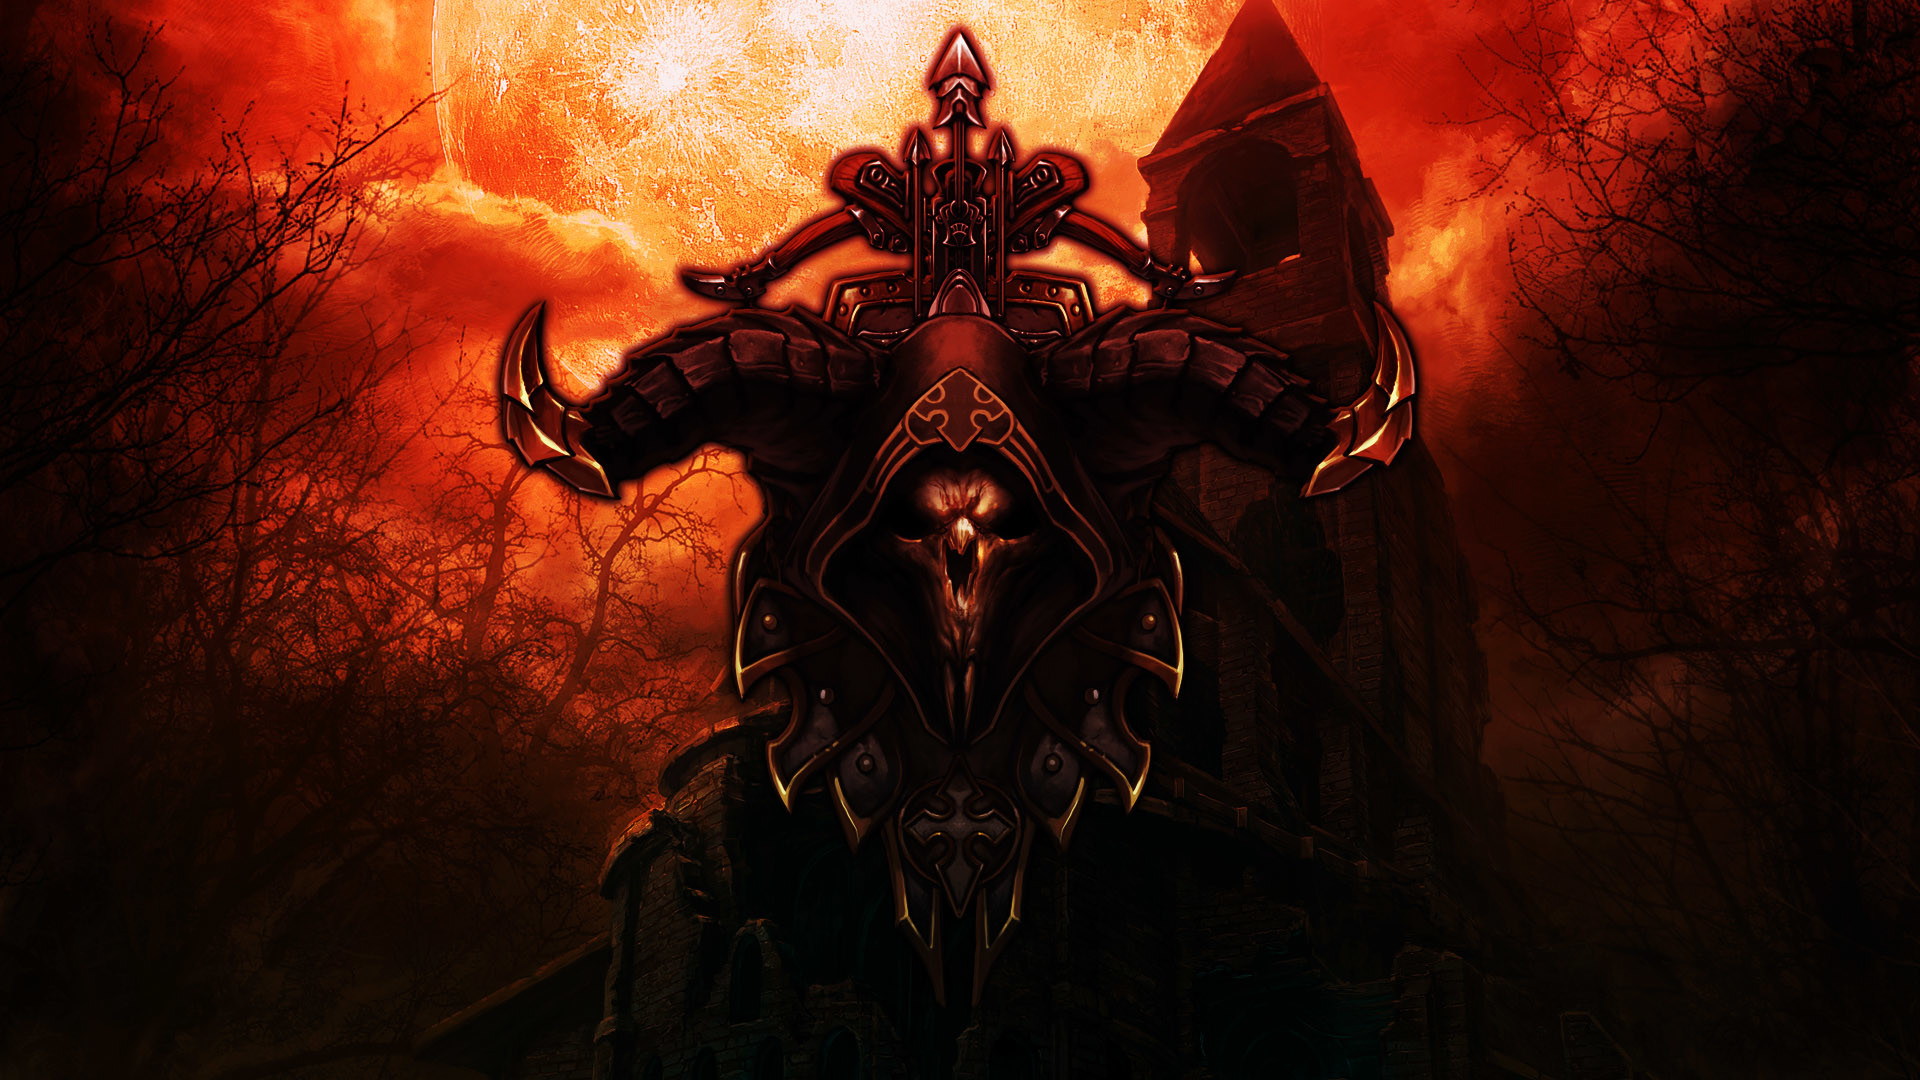 Demons Wallpapers Wallpaper